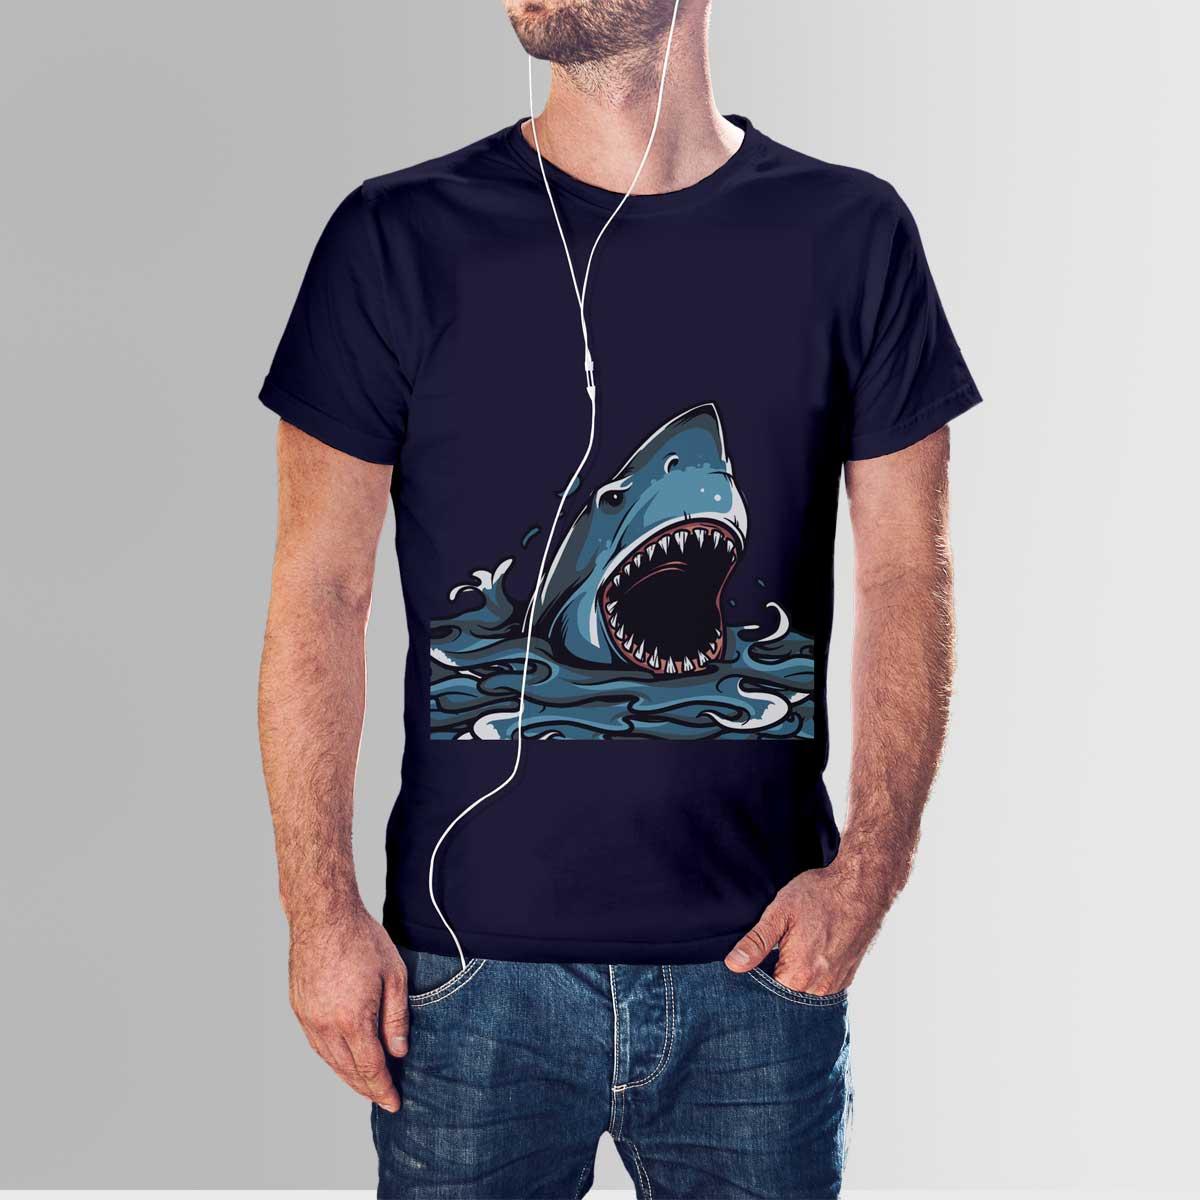 Blue Whale T Shirt T Shirt Design Your Own